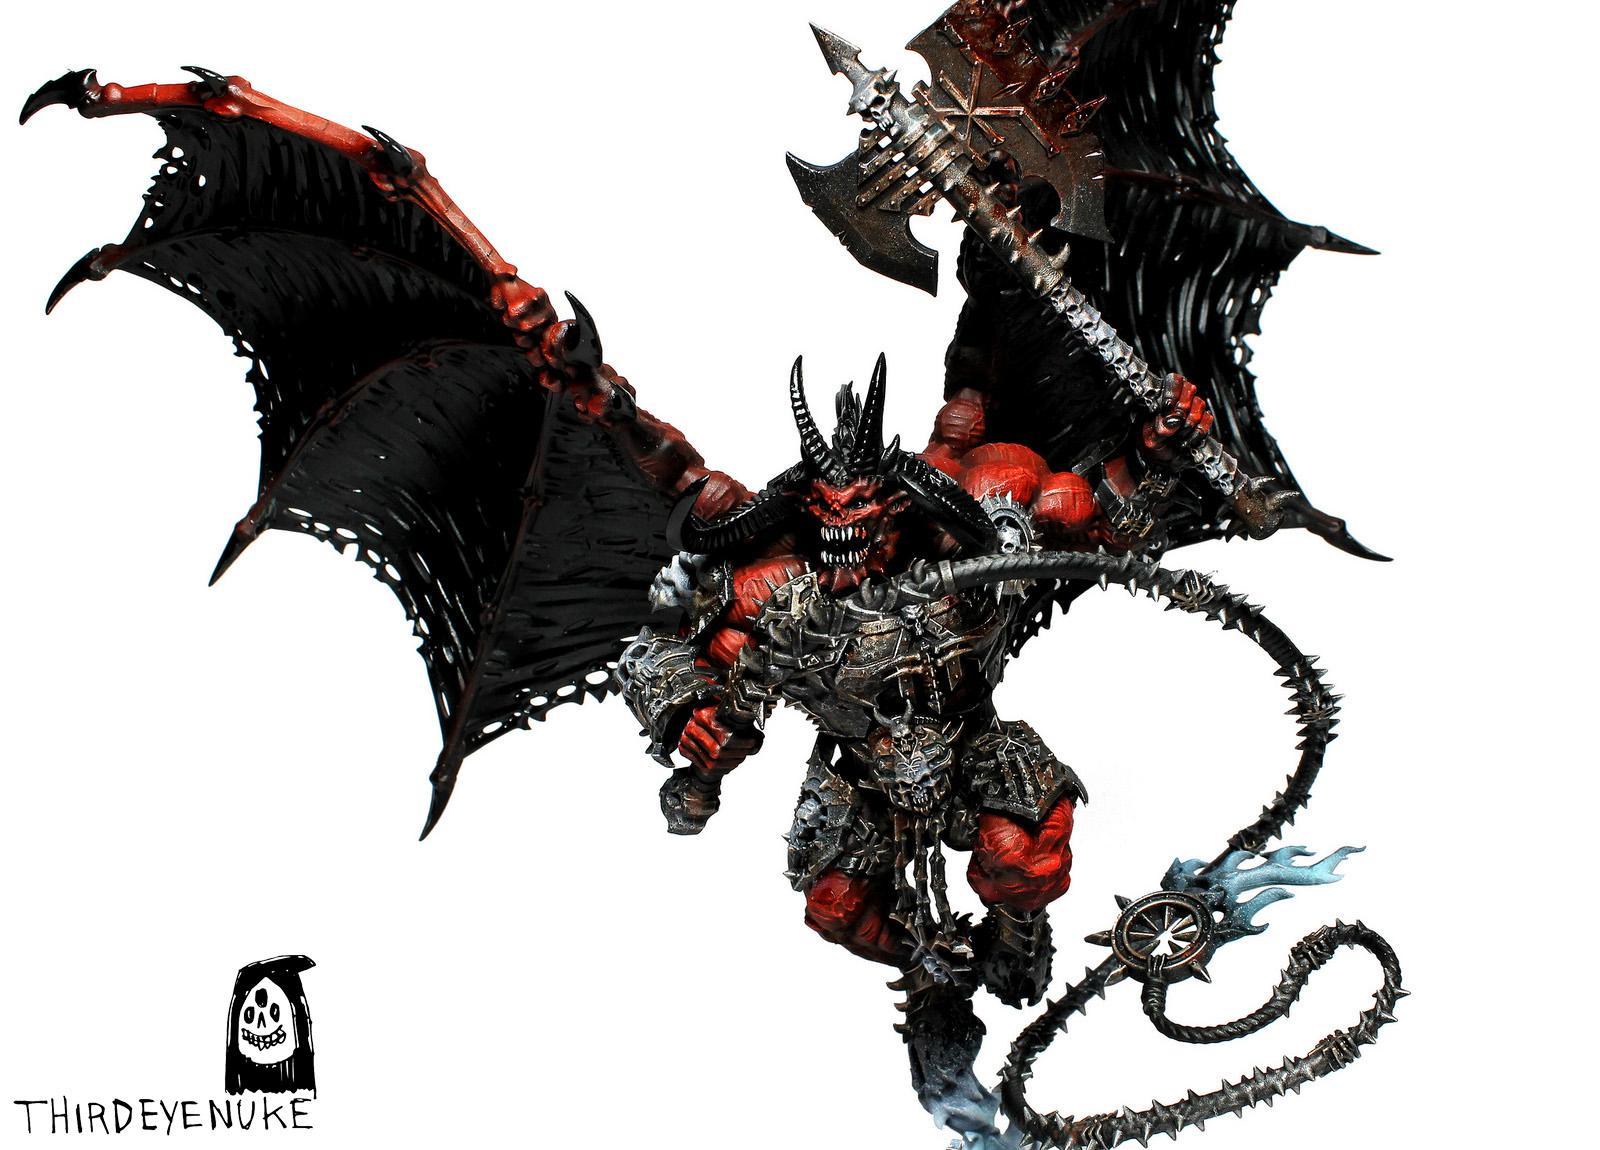 Chaos, Daemons, Khorne Bloodthirster, Thirdeyenuke, Warhammer Fantasy